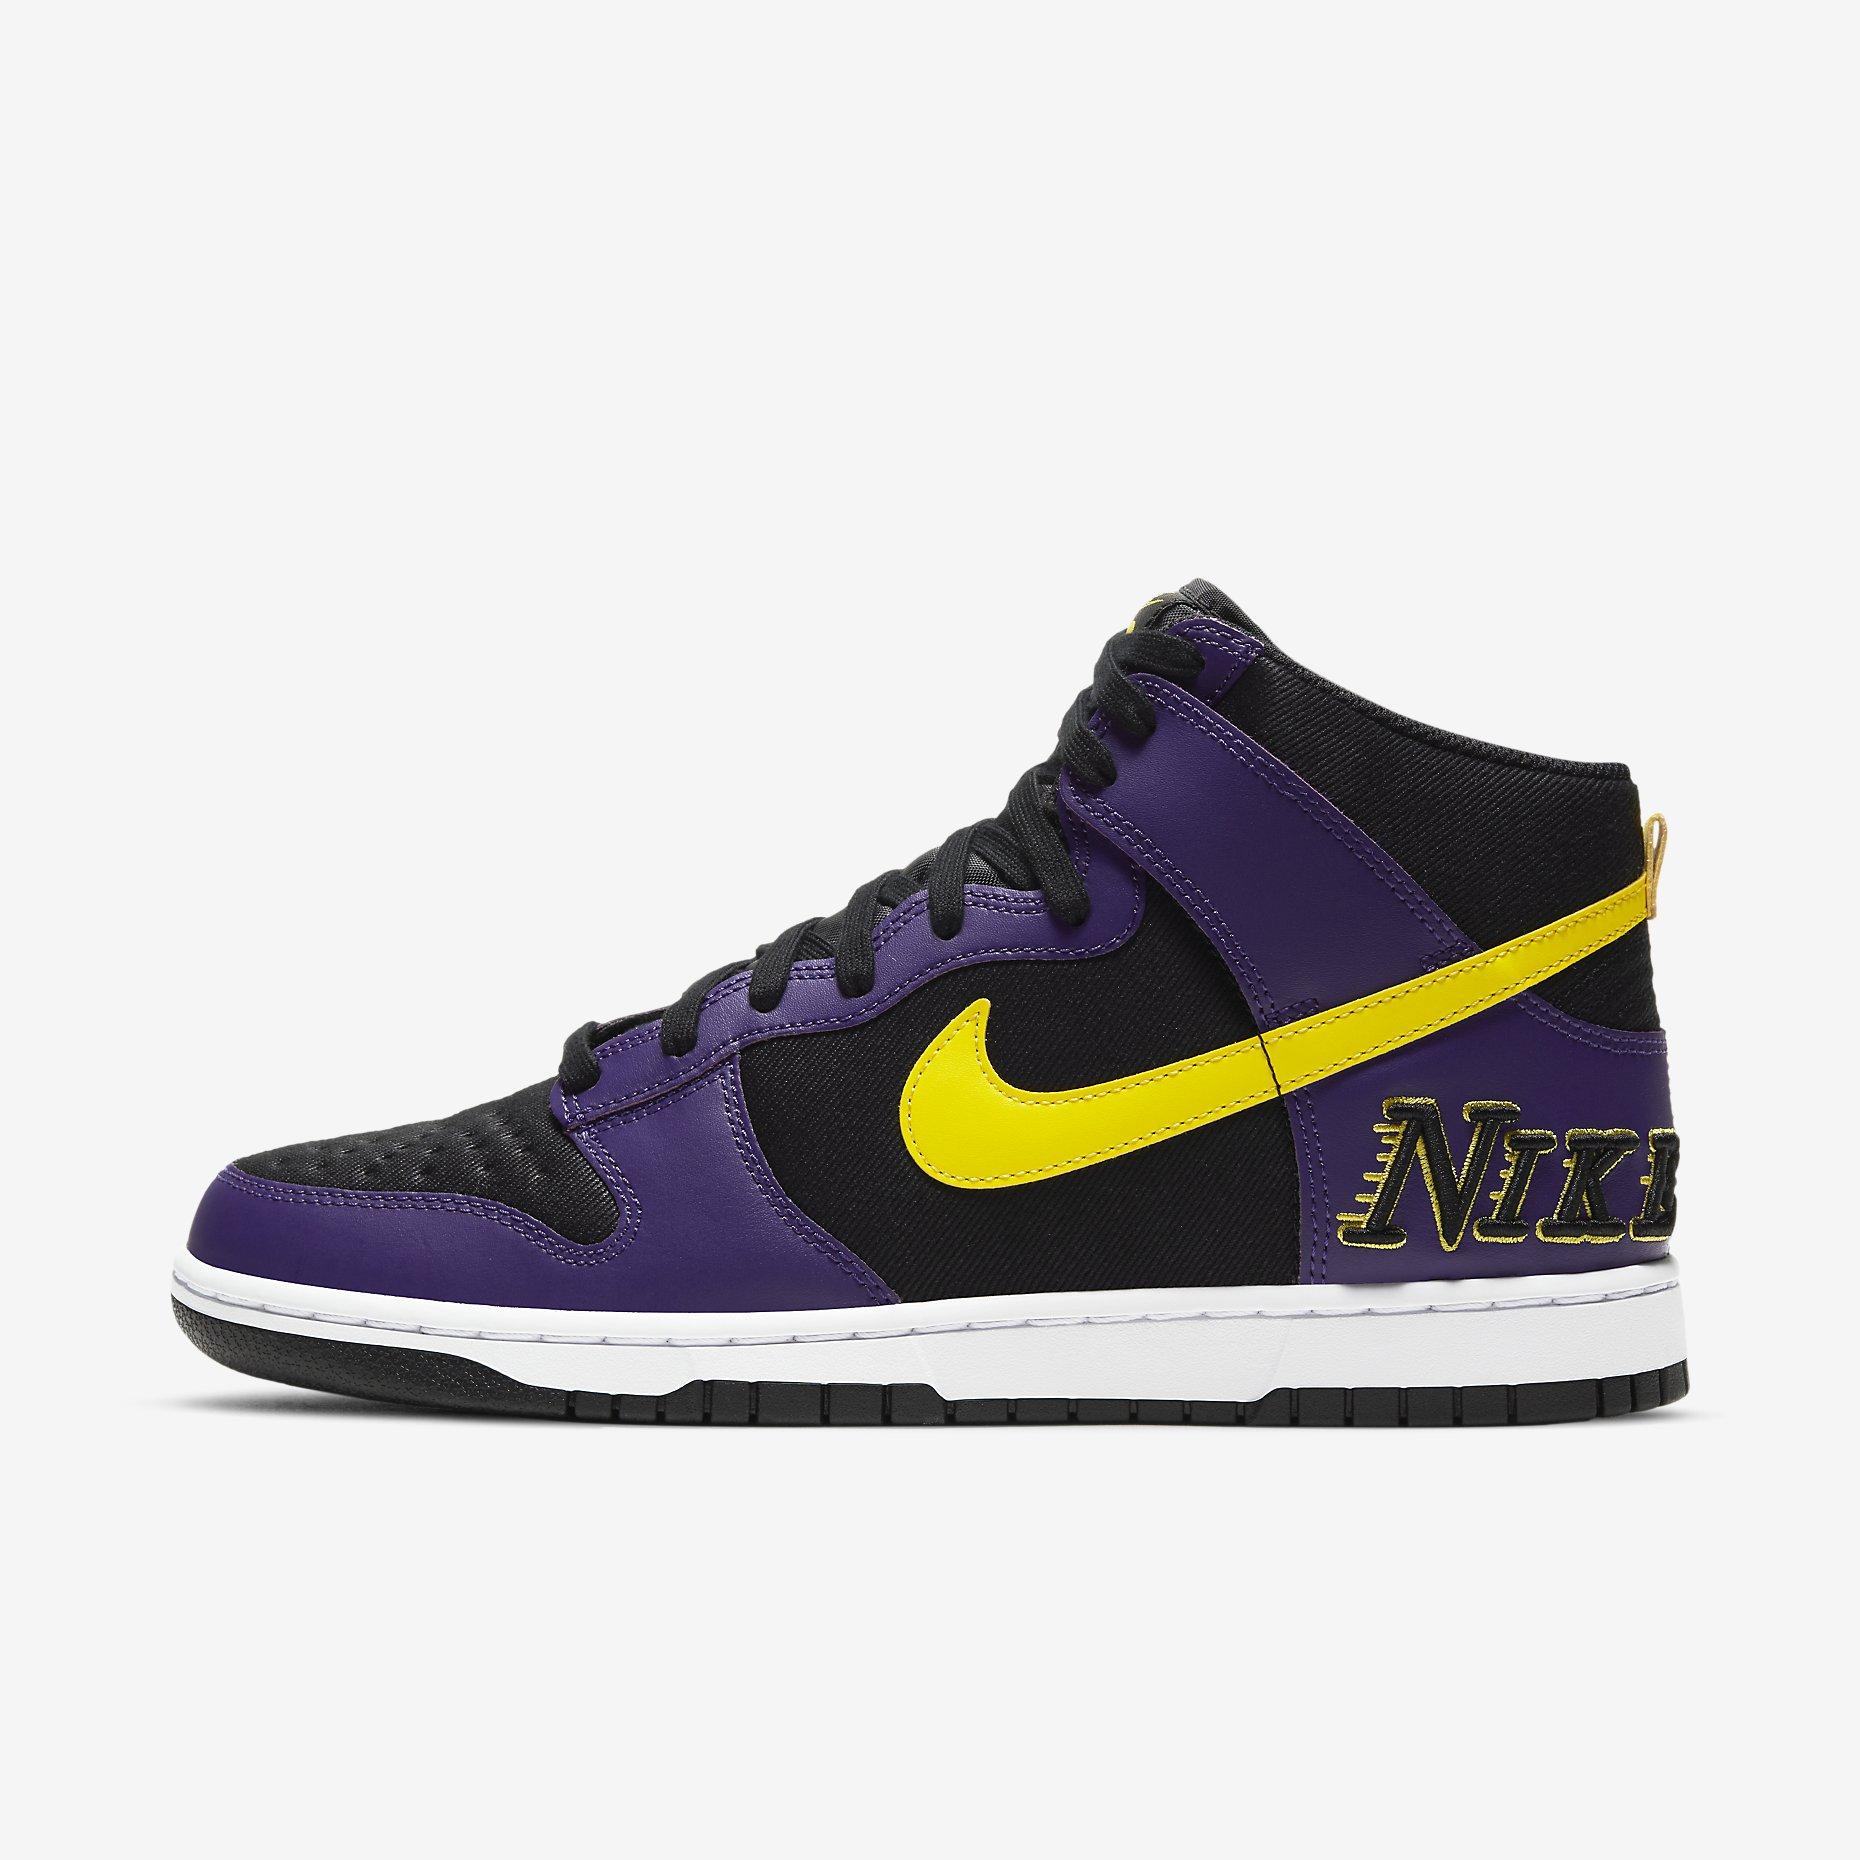 Nike Dunk High EMB 'Court Purple' - 'Lakers'}